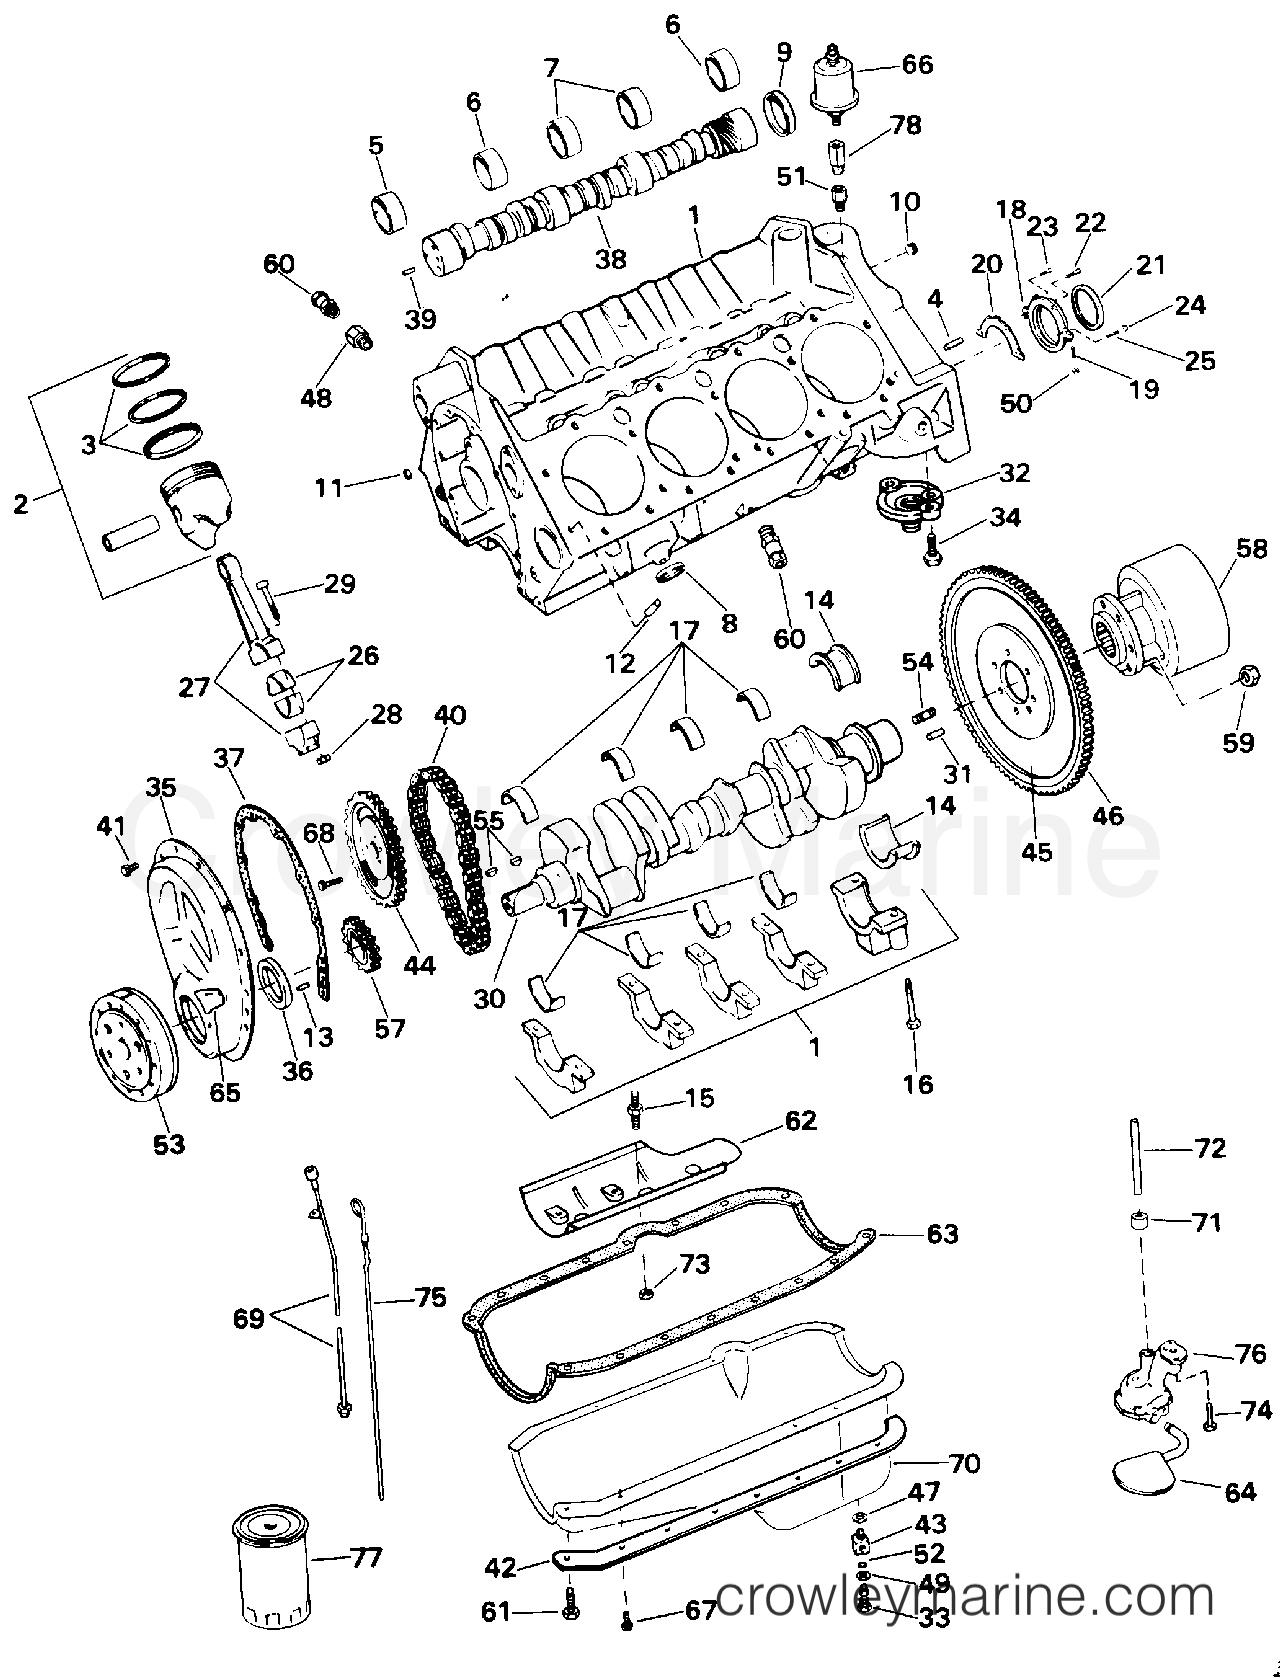 1994 OMC Stern Drive 5.7 - 572AGPMDA - CRANKCASE